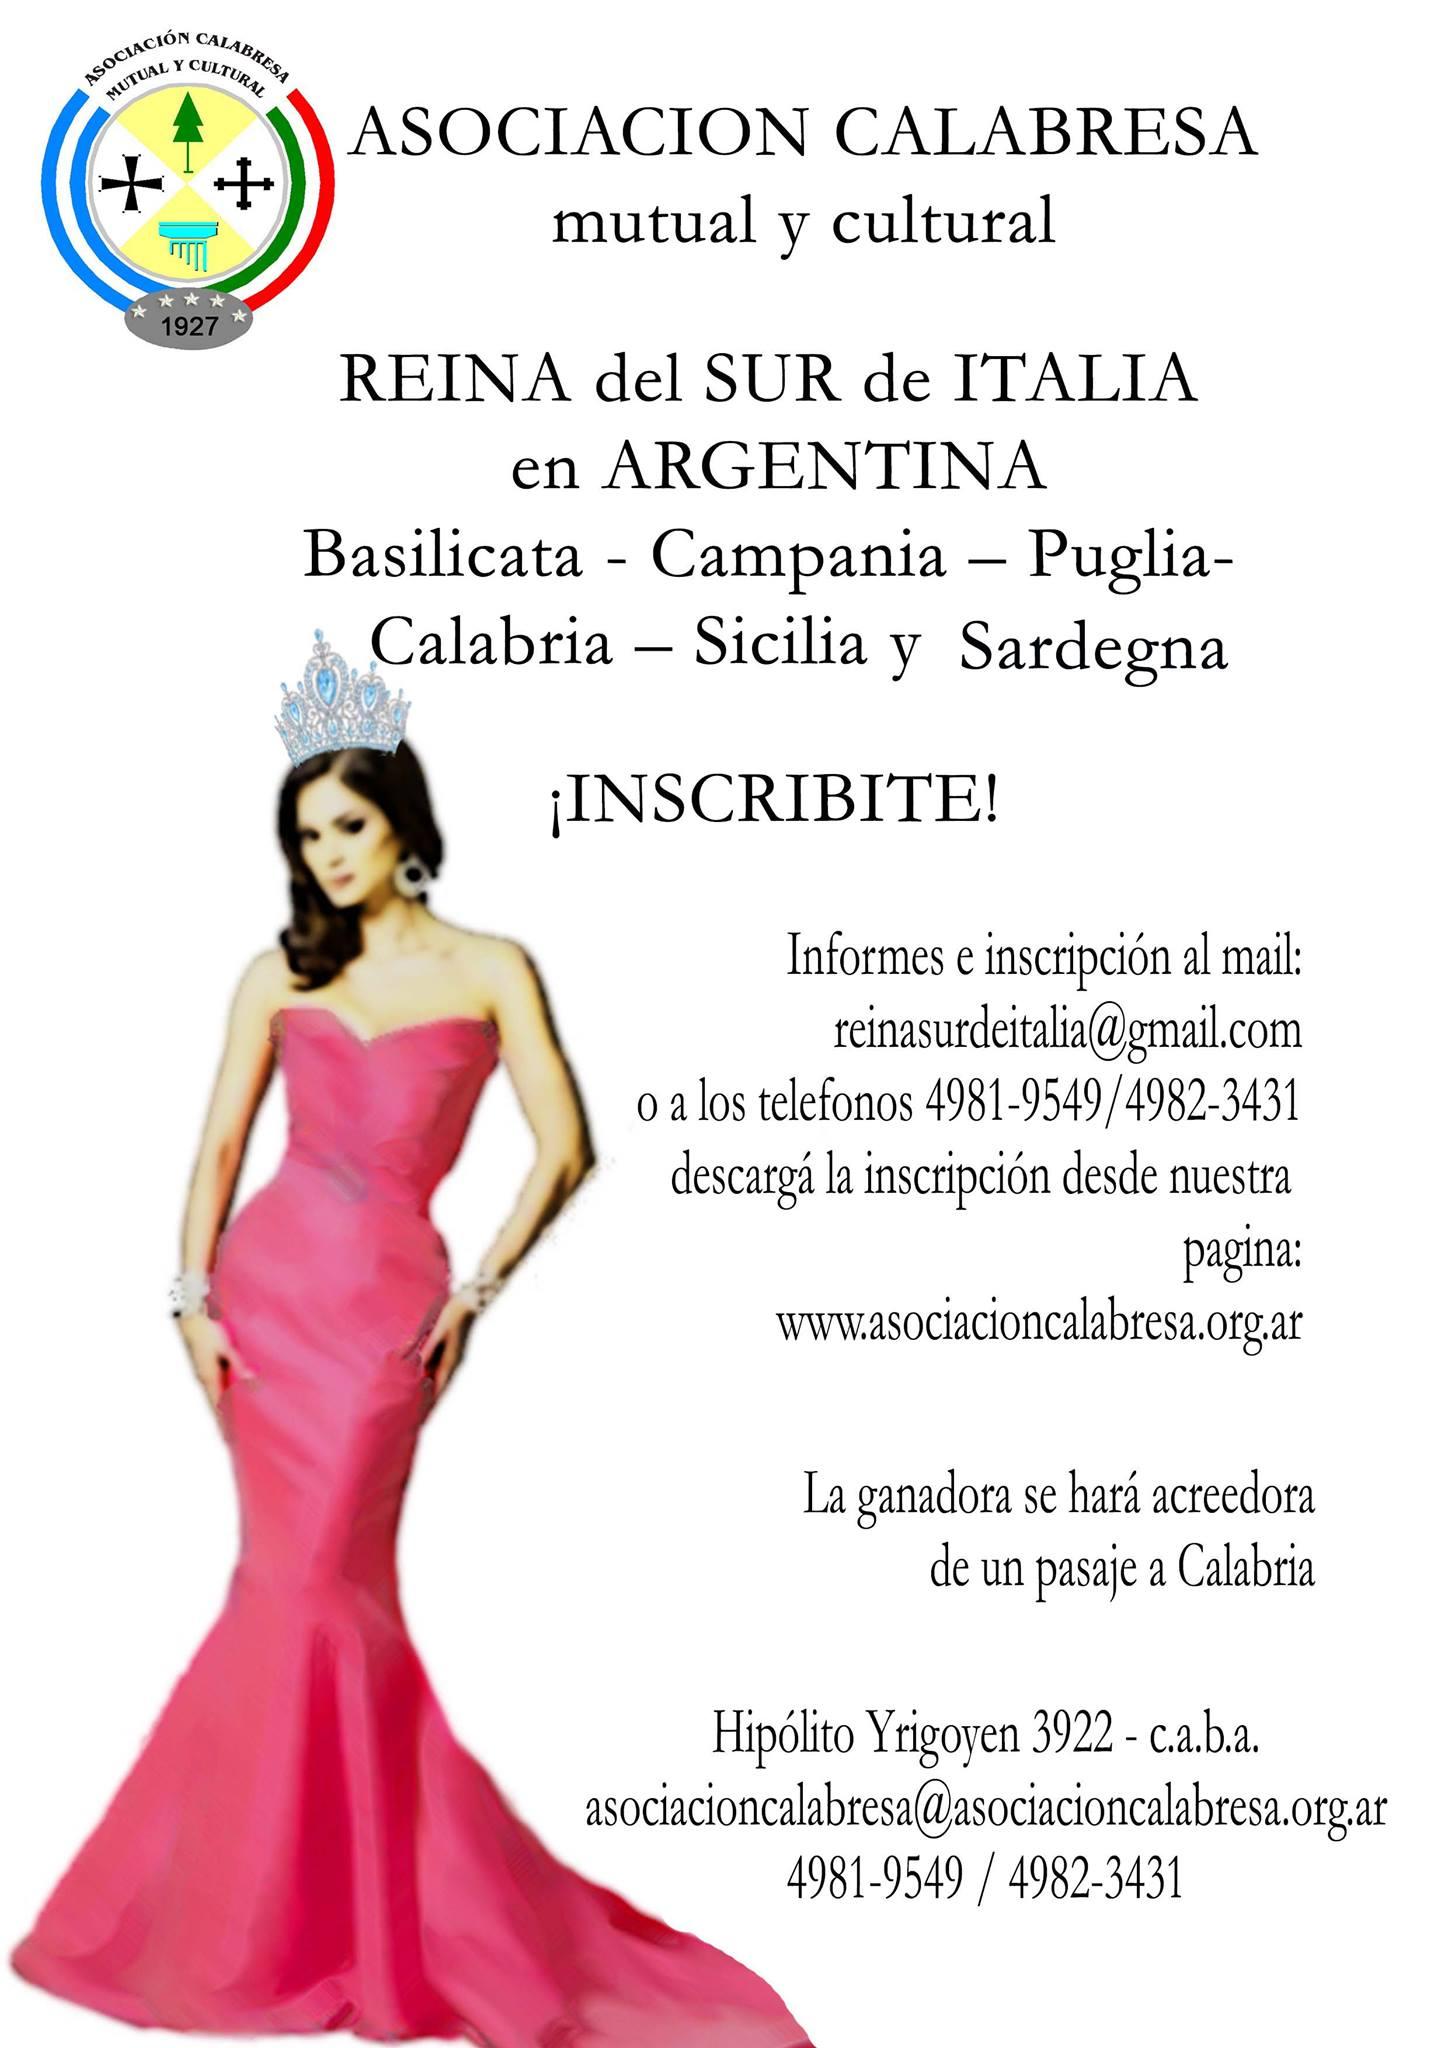 Reina Del Sur De Italia - Certamen Reina Del Sur De Italia